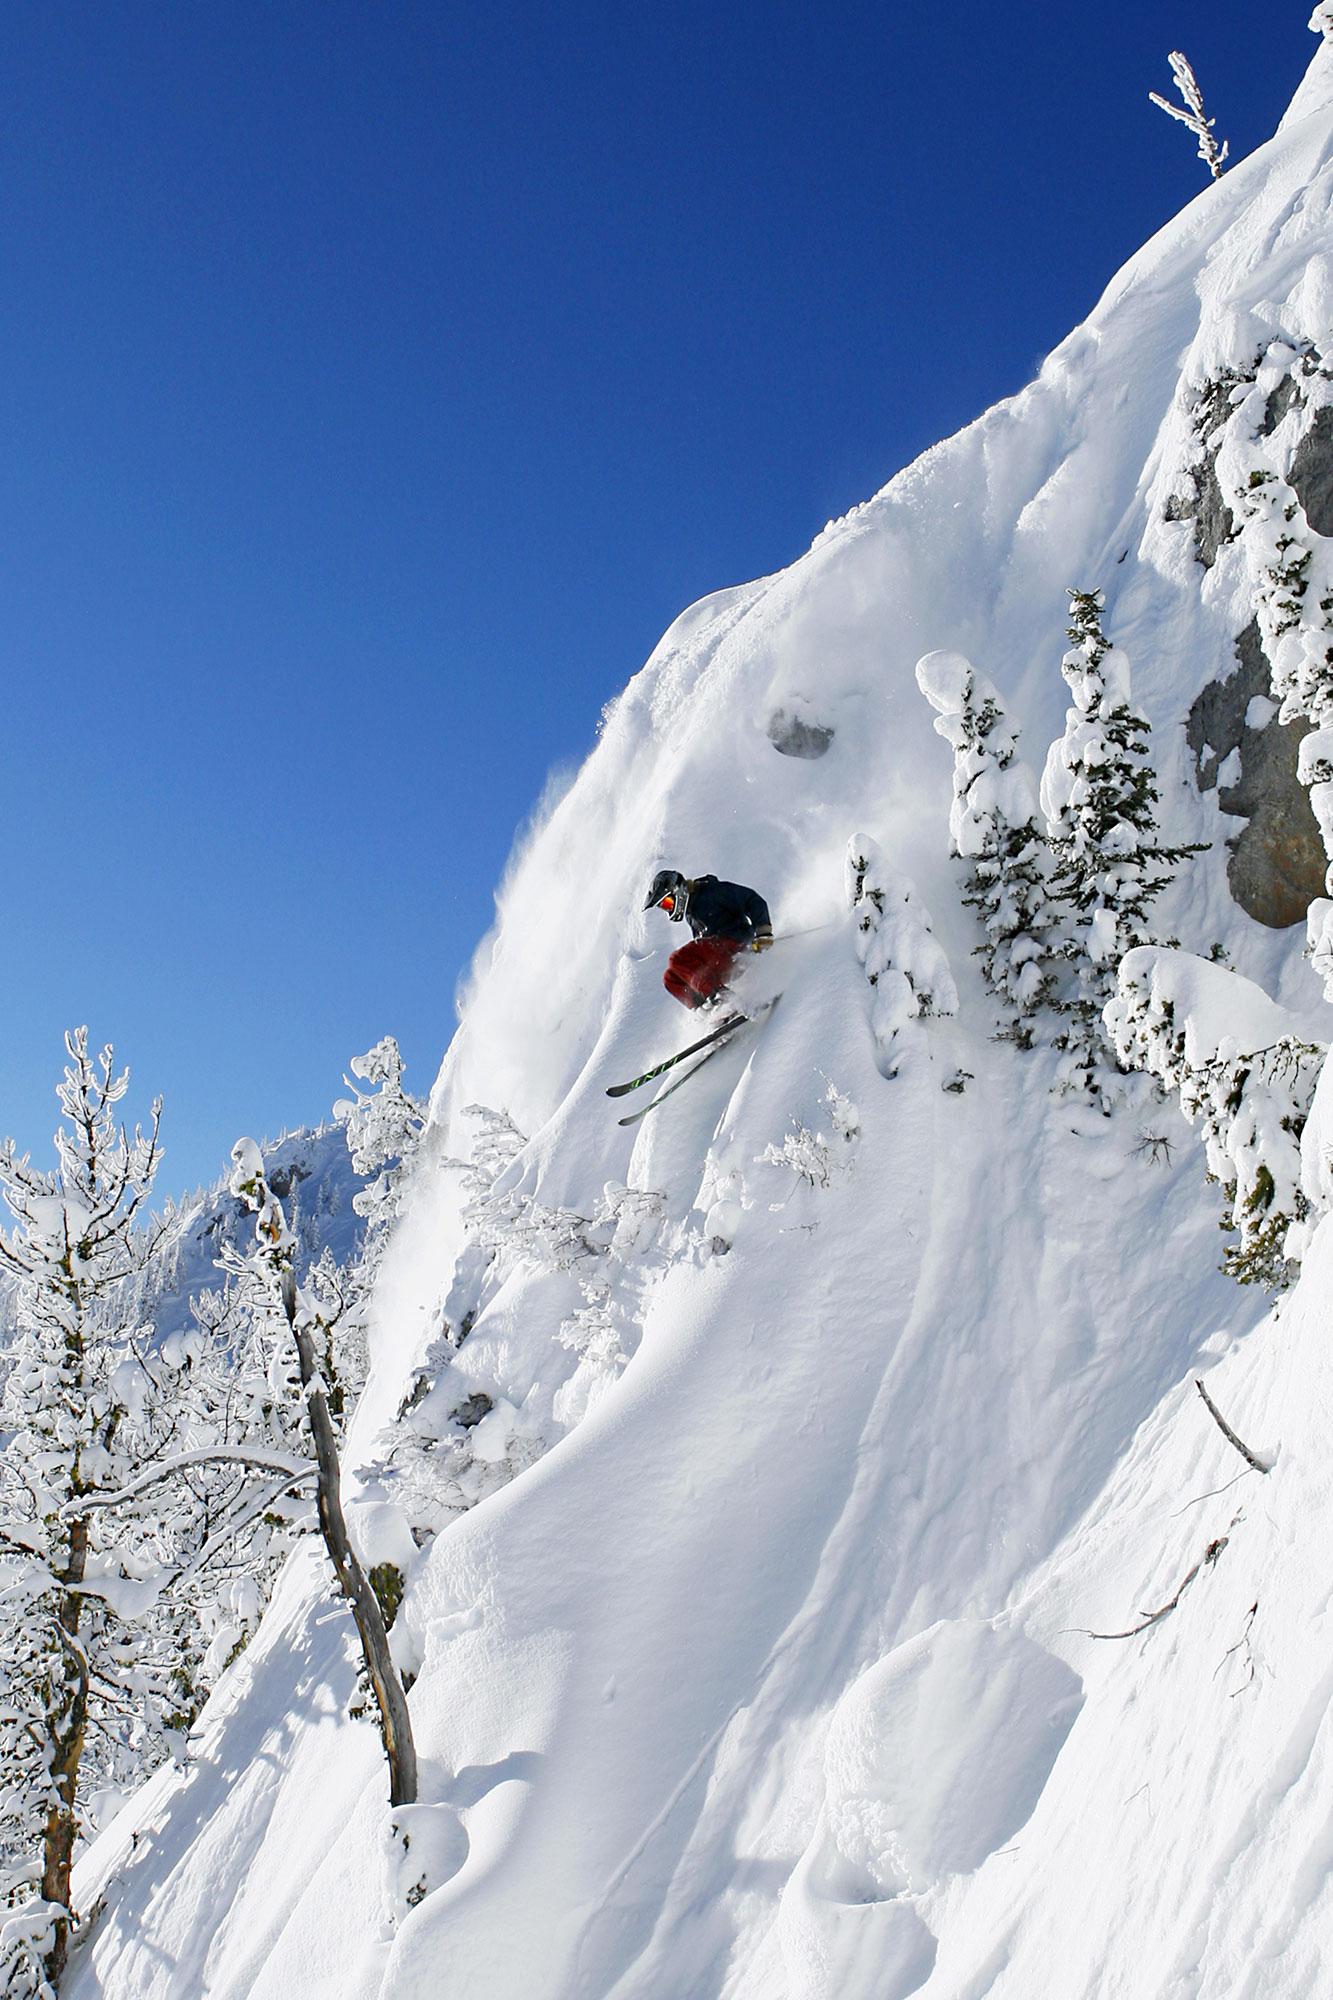 Matt Shortland on The Ridge By Pat Clayton